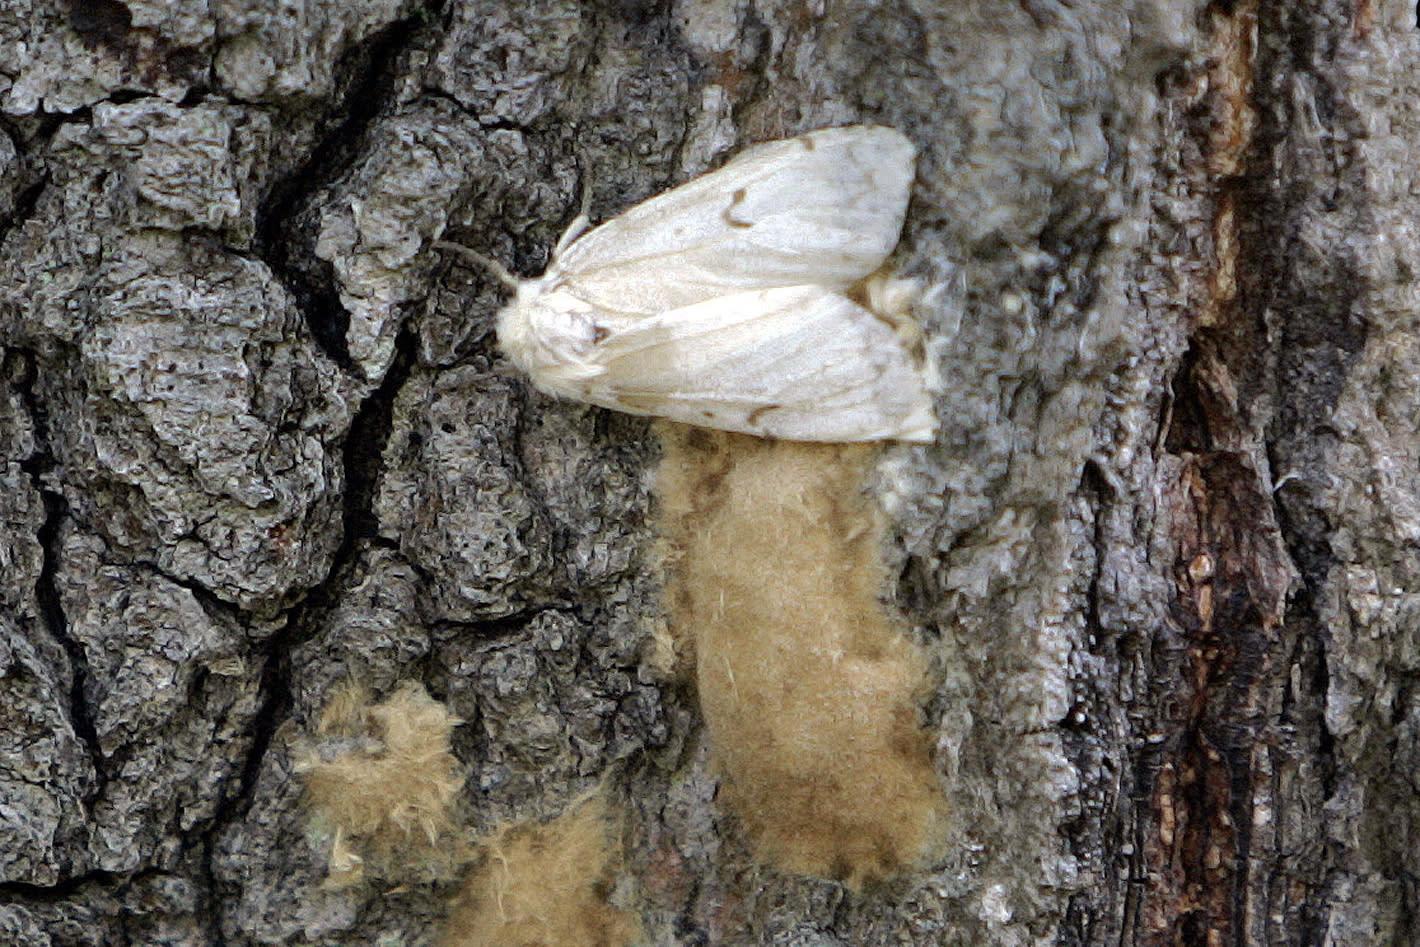 Bug experts seeking new name for destructive gypsy moths